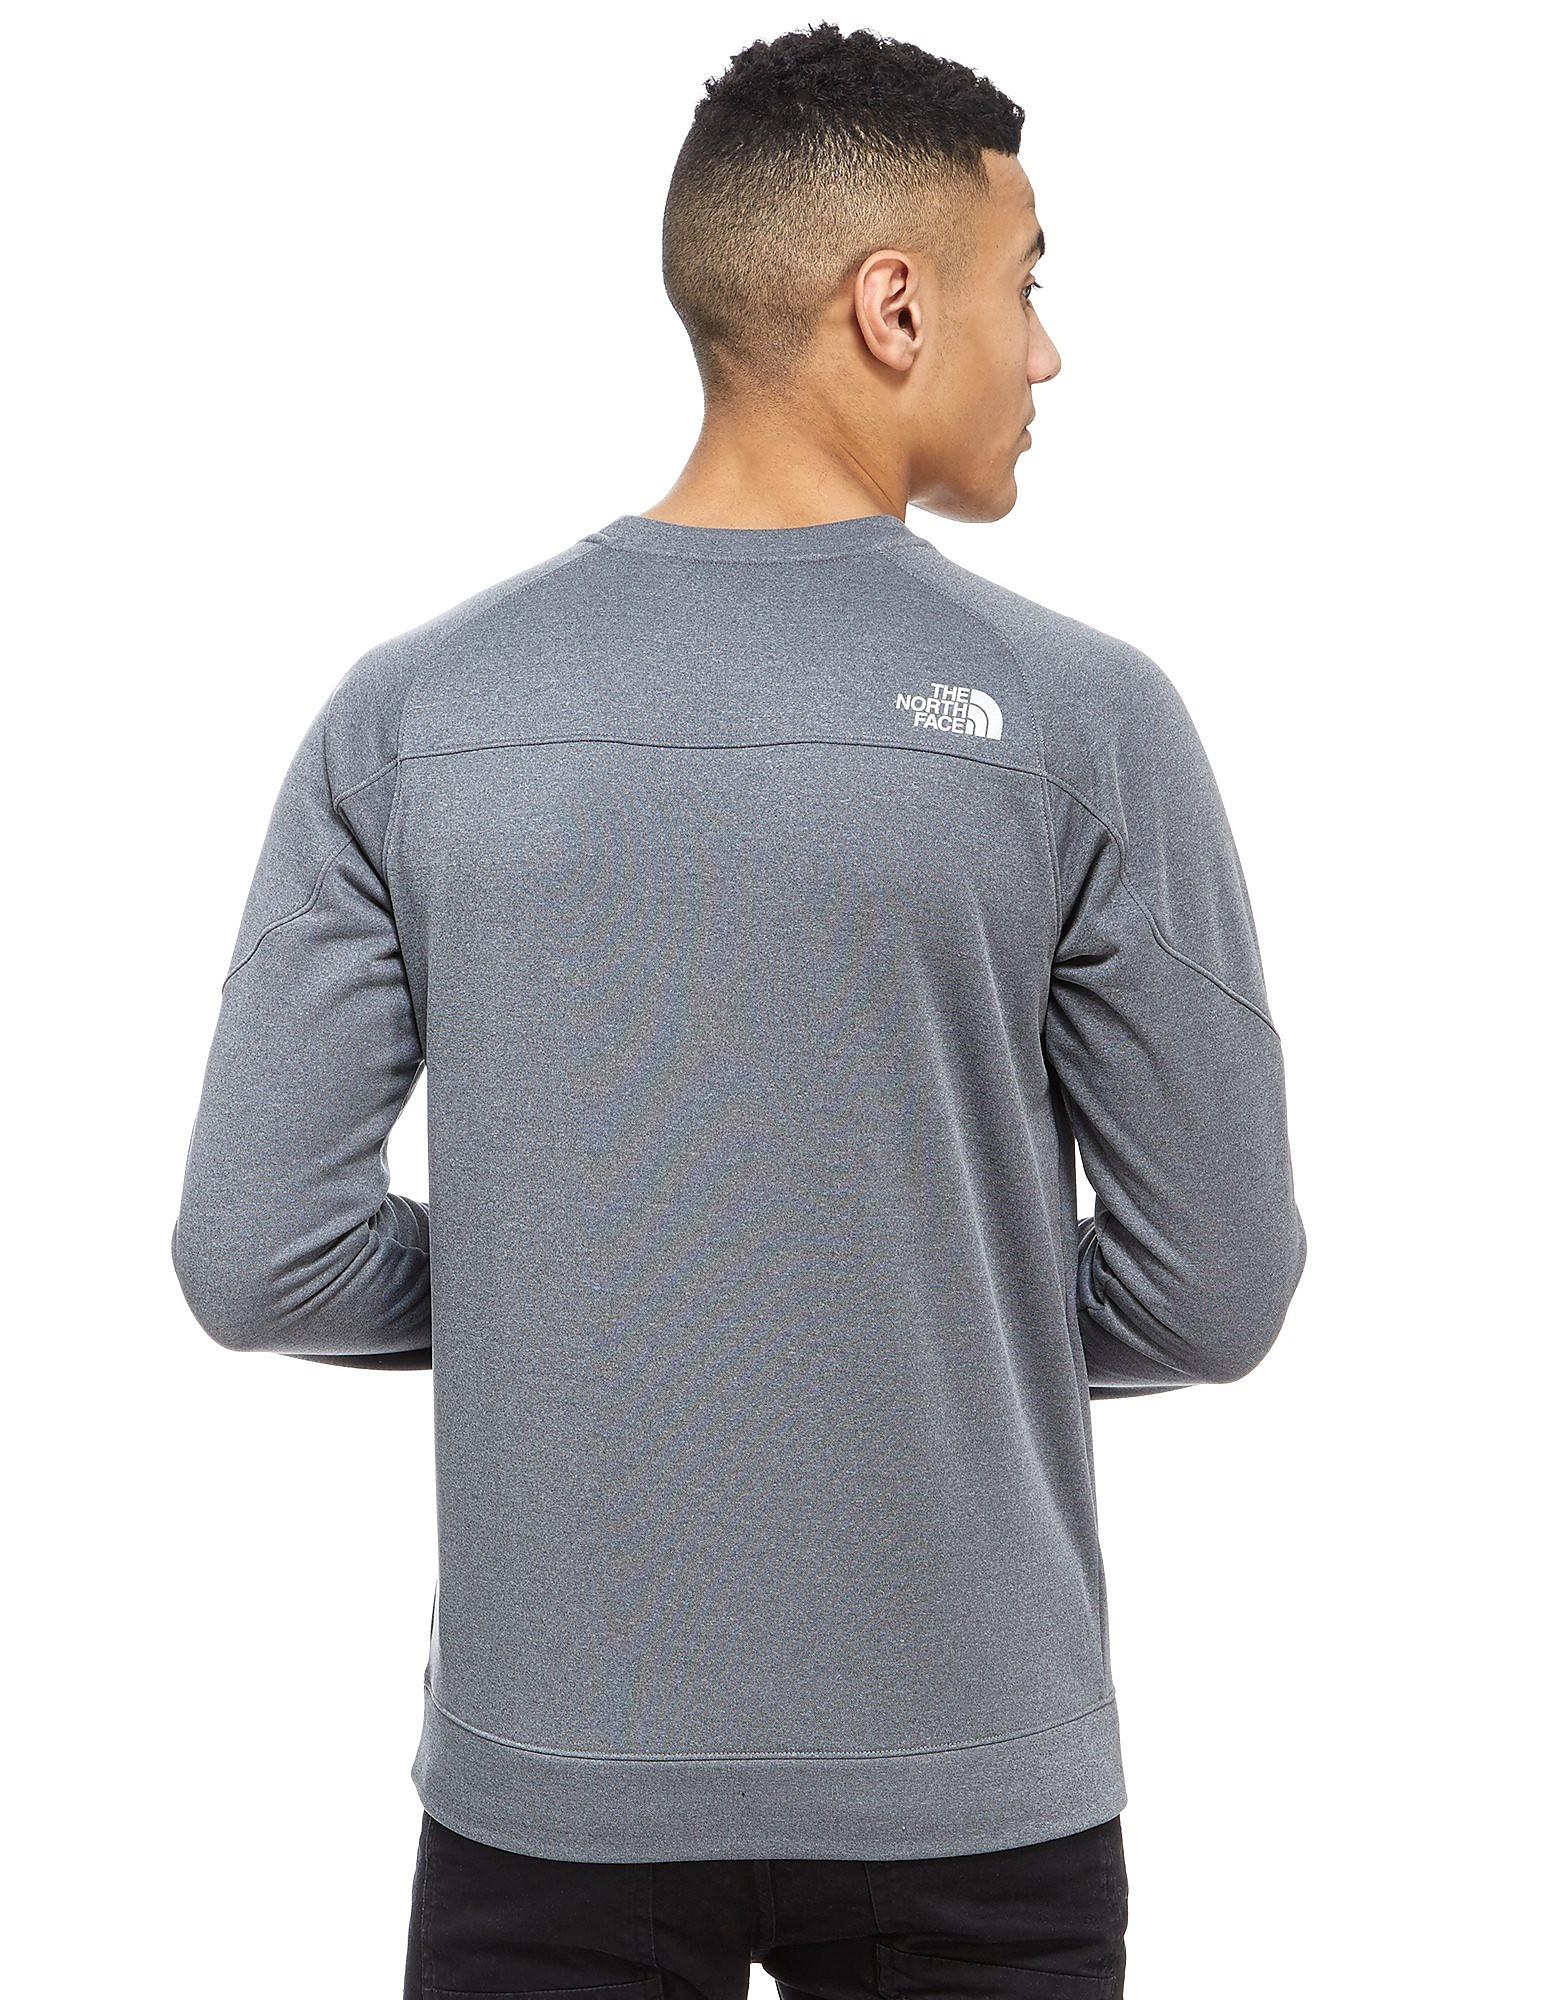 The North Face Mittellegi Sweatshirt